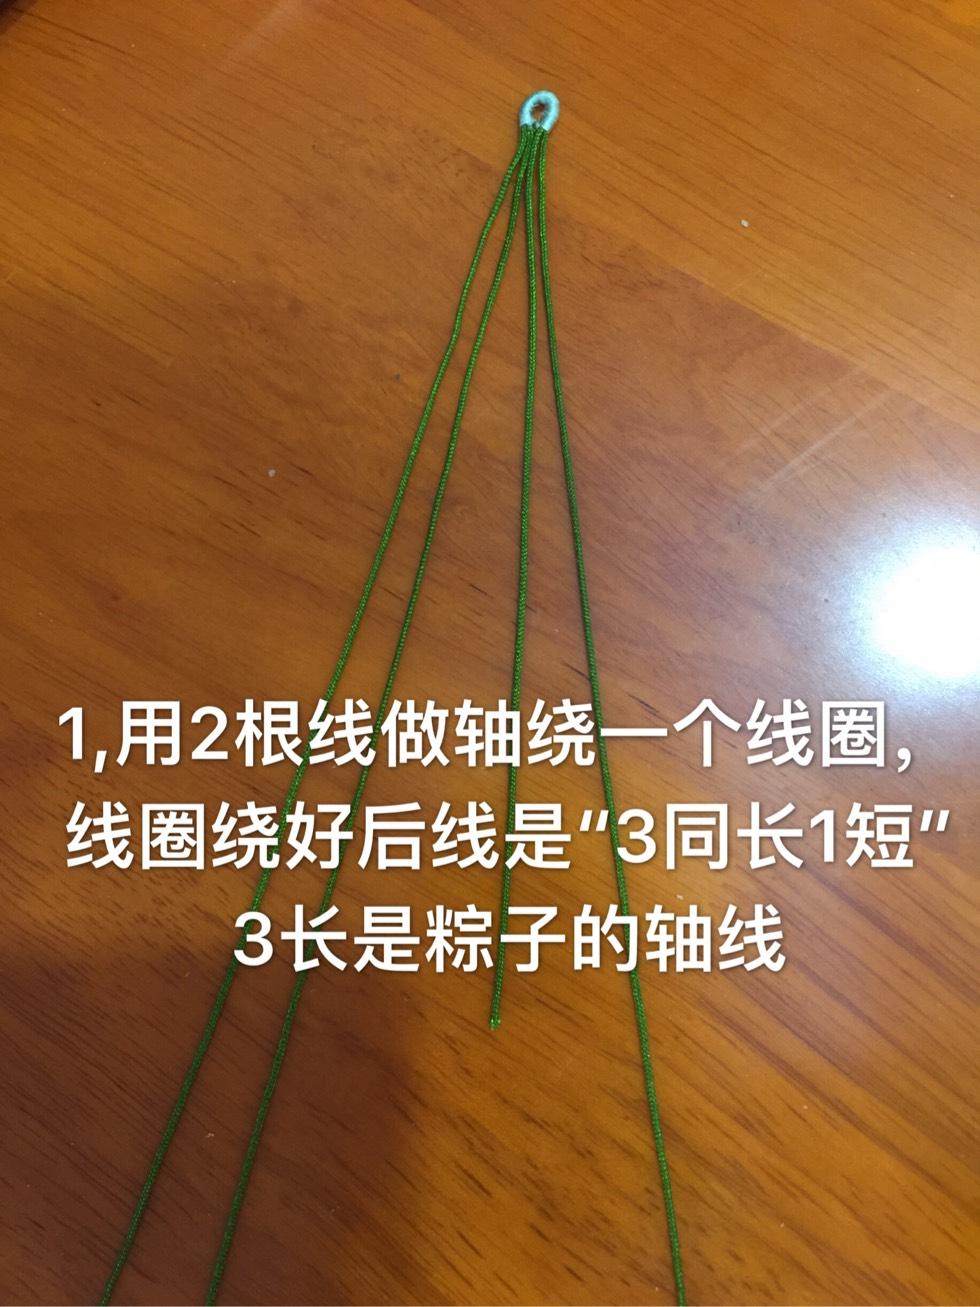 中国结论坛 粽子教程  图文教程区 195719ahhhv0o22yhhh6ht